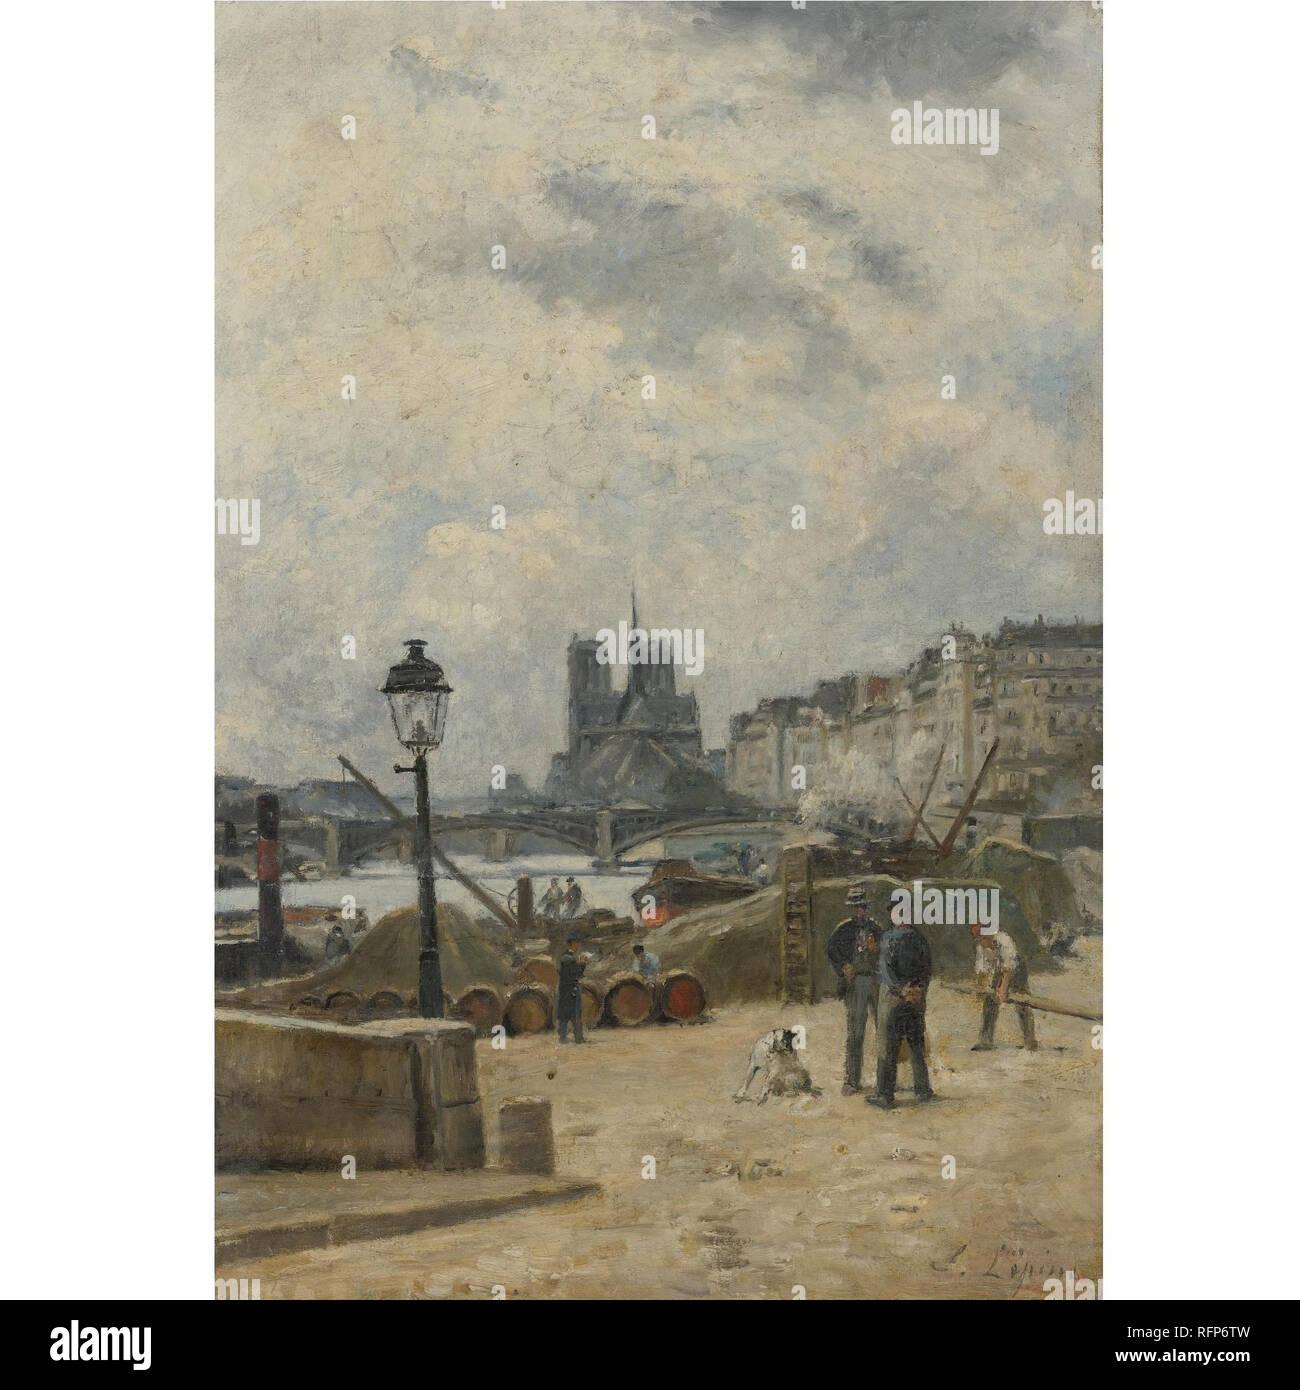 Stanislas Lpine 1835 - 1892 FRENCH THE SEINE AT PONT SULLY AND LE QUAI HENRI IV.jpg - RFP6TW Stock Photo